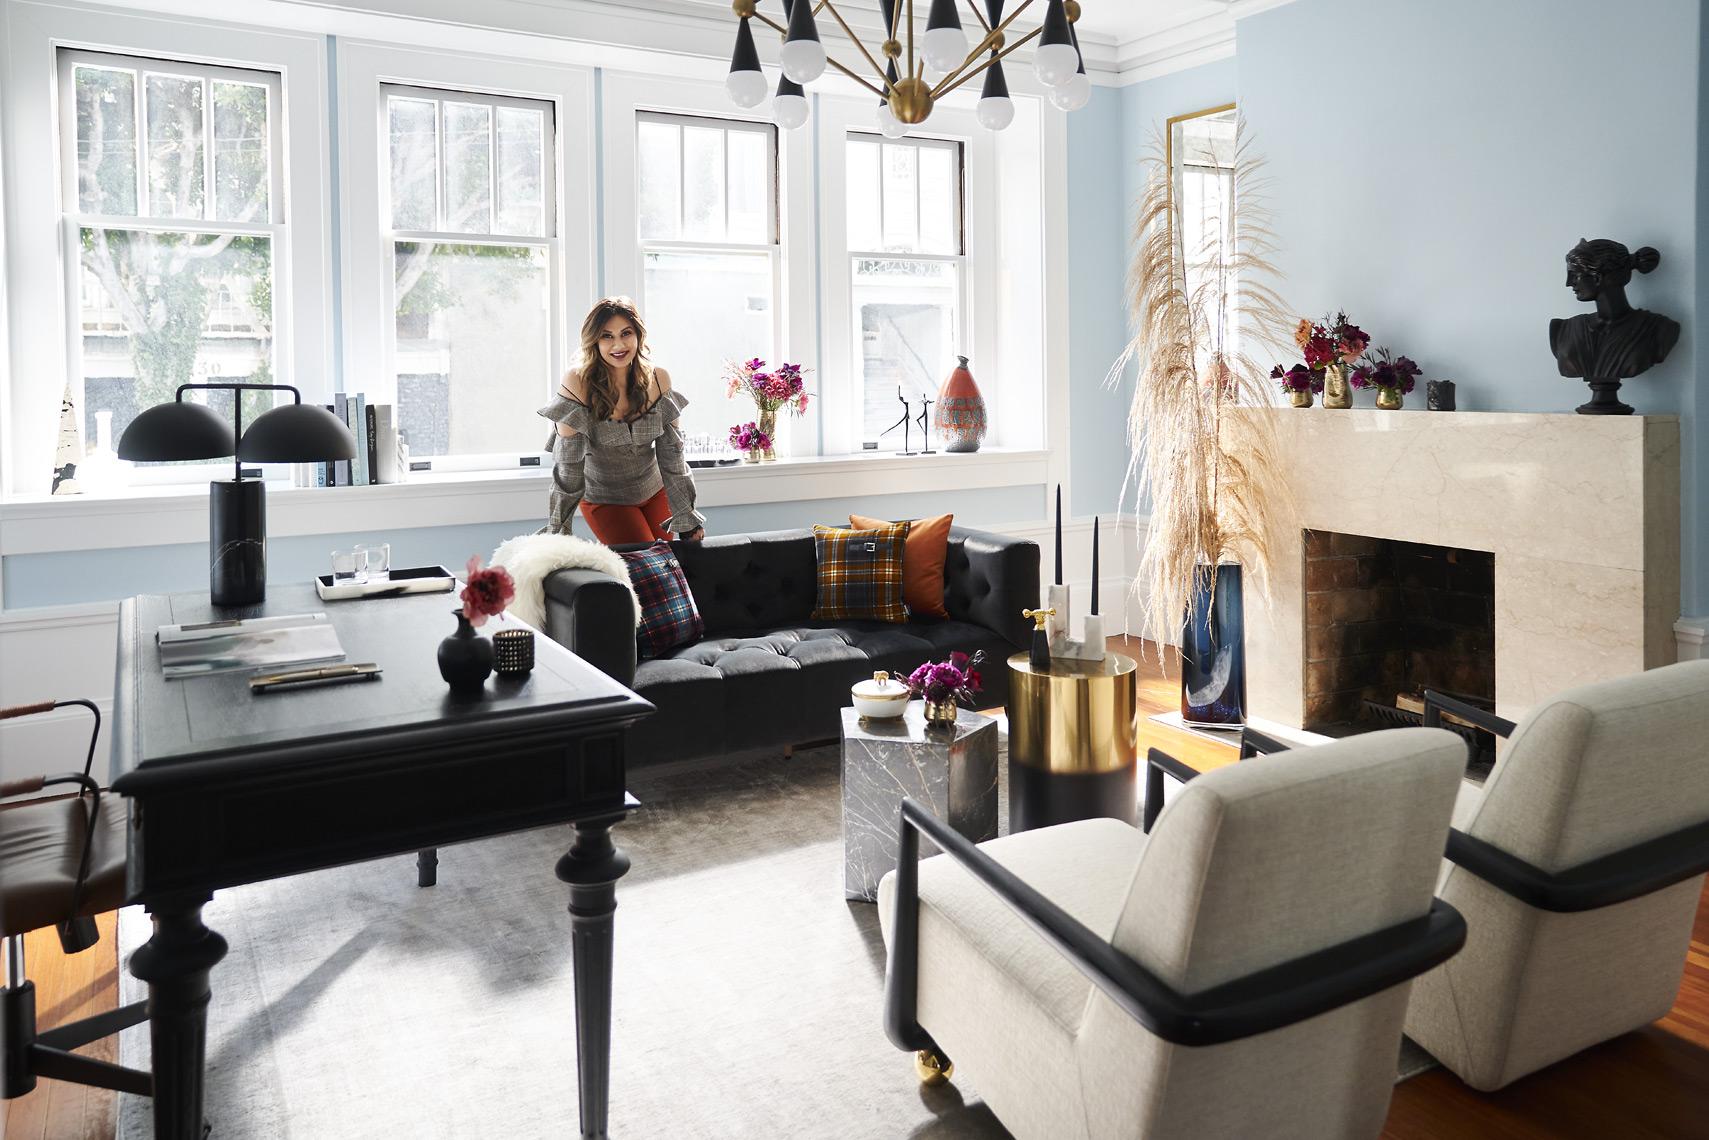 rterior-studio-los-angeles-ca-edwardian-beauty-designer-standing-in-edwardian-inspired-office